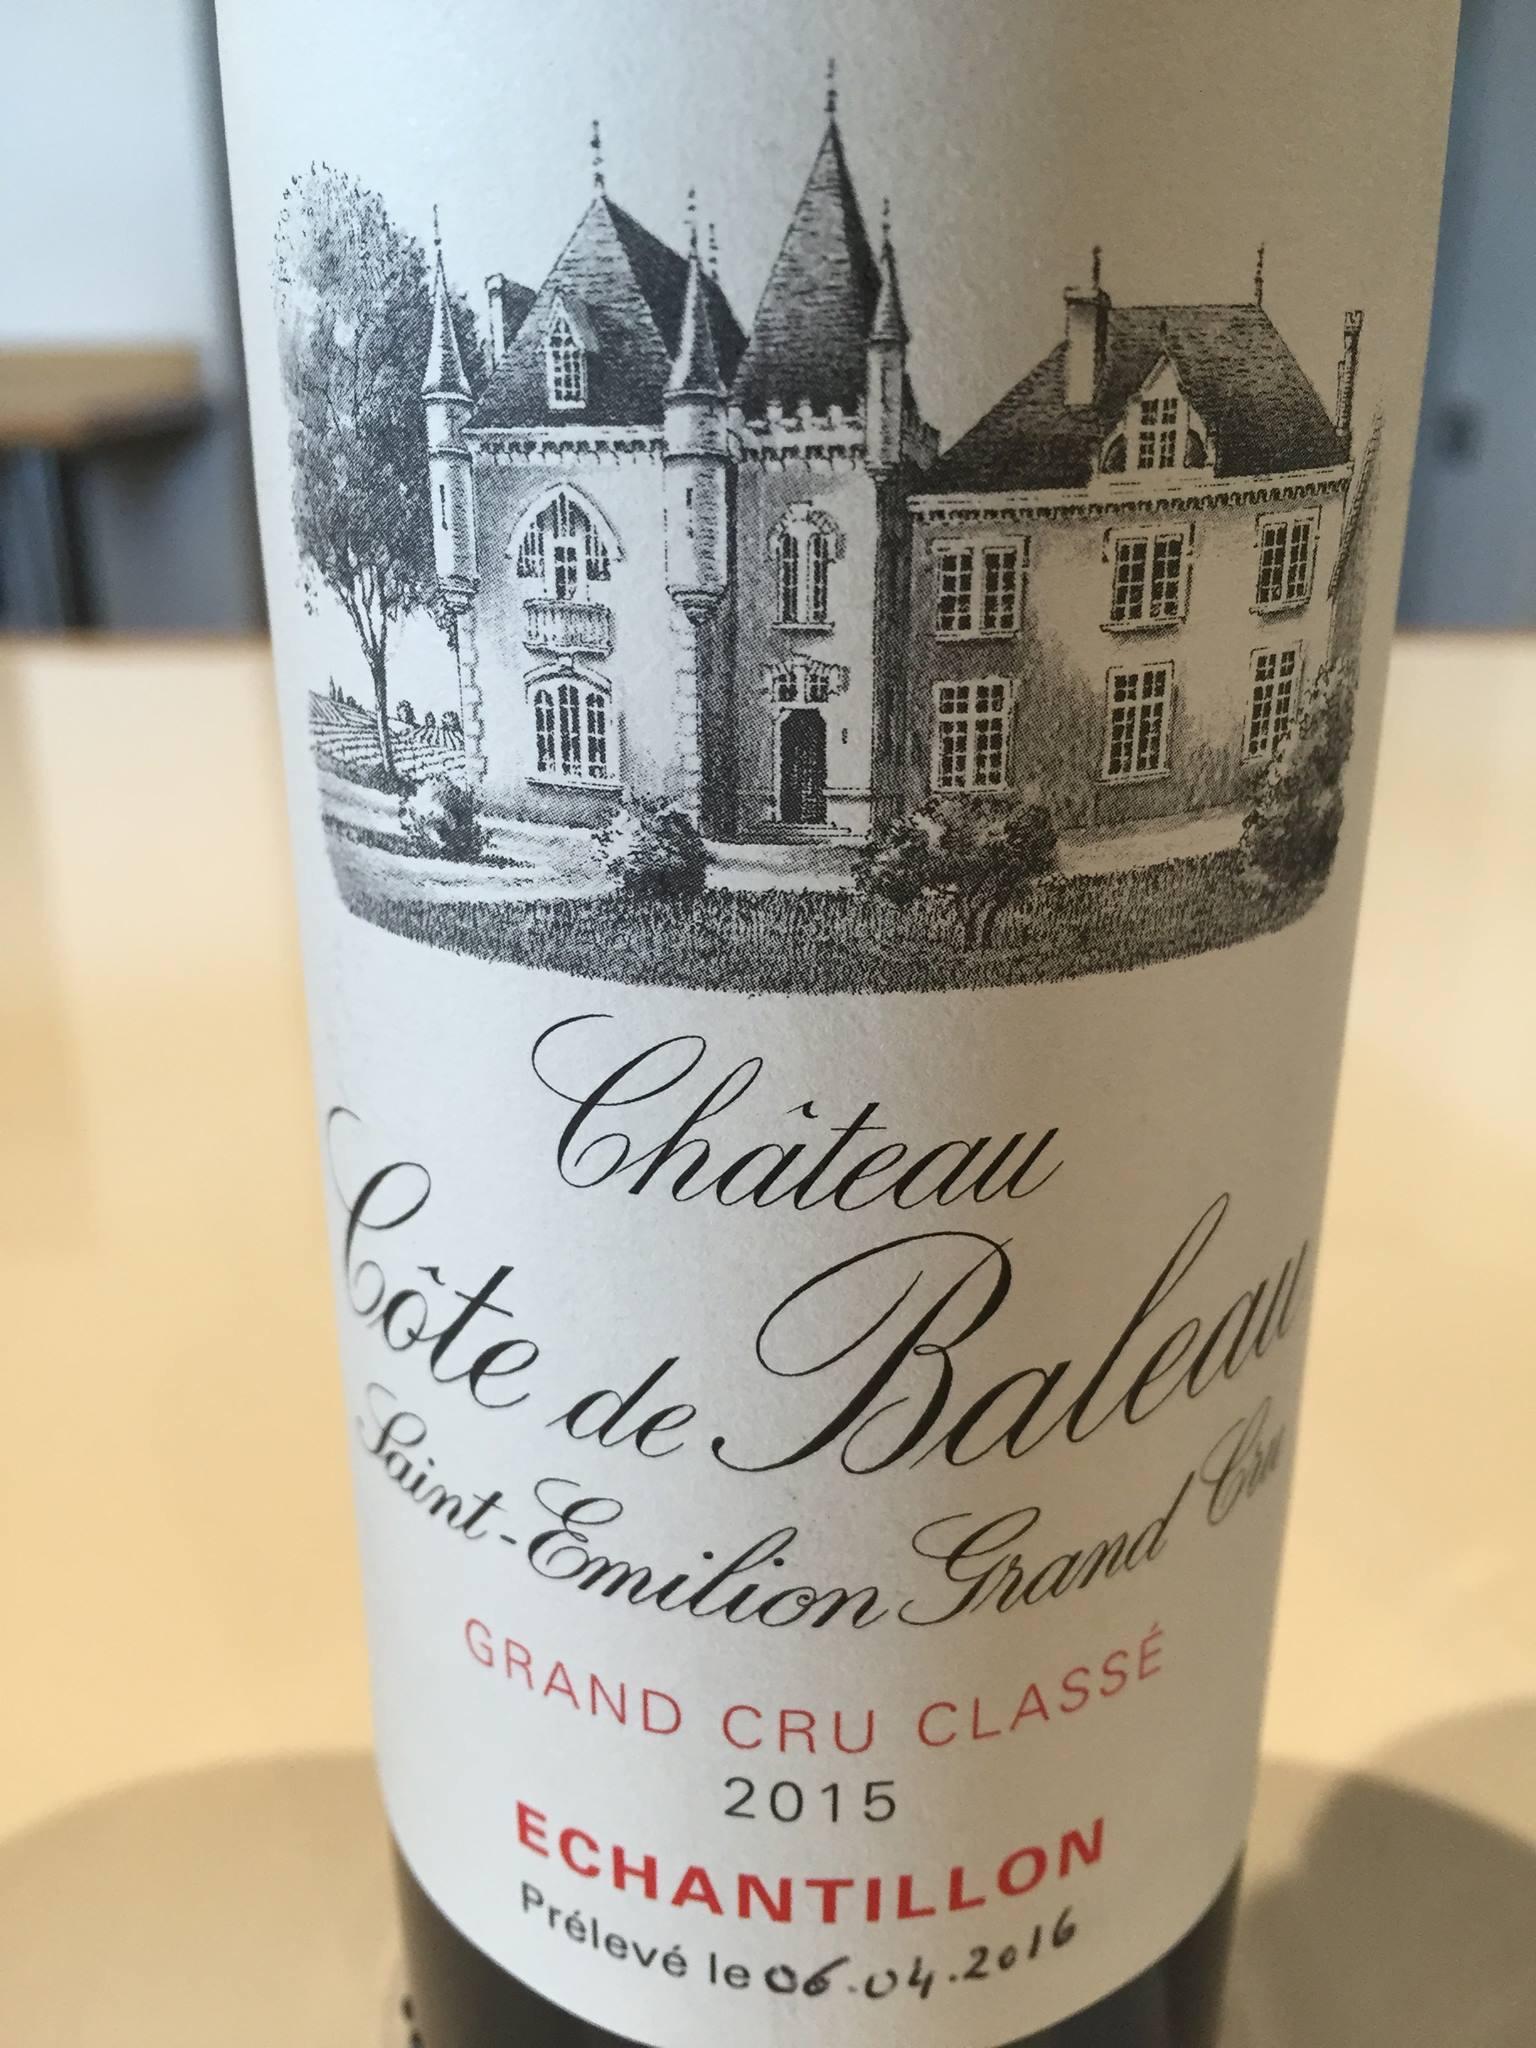 Château Côte de Baleau 2015 – Saint-Emilion Grand Cru Classé